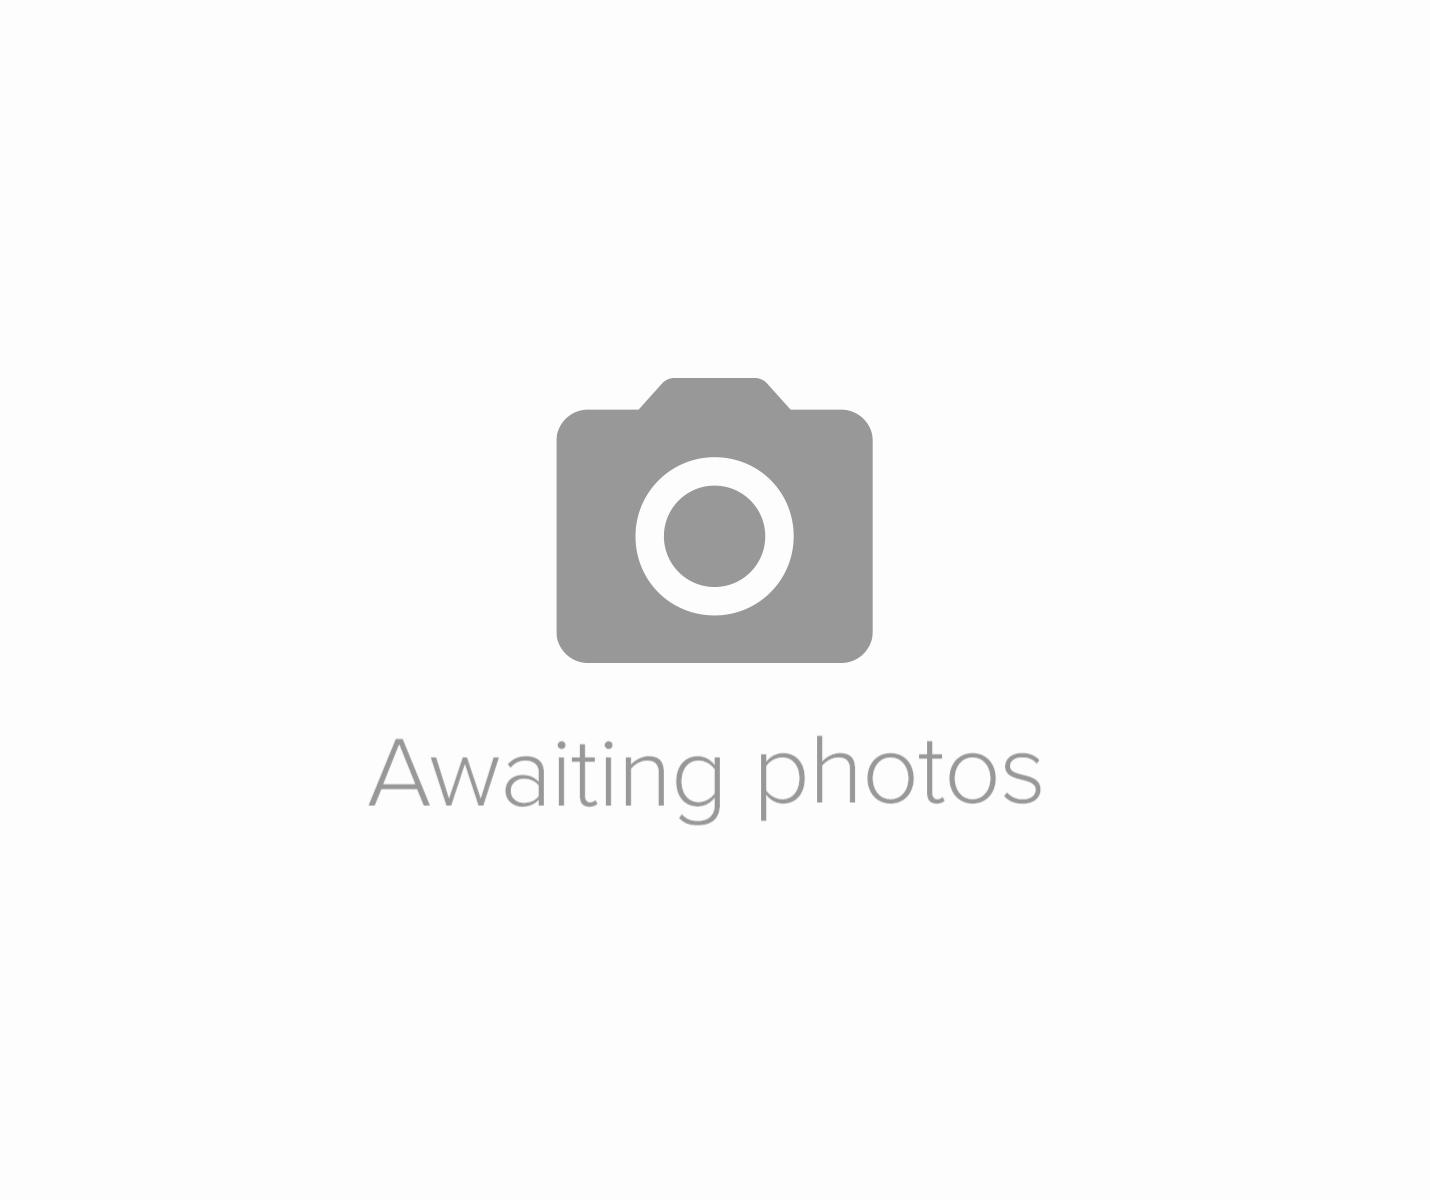 2007 Suzuki Jimny PX SWAP Car 4x4 Nissan Toyota Honda For Sale | Car And Classic